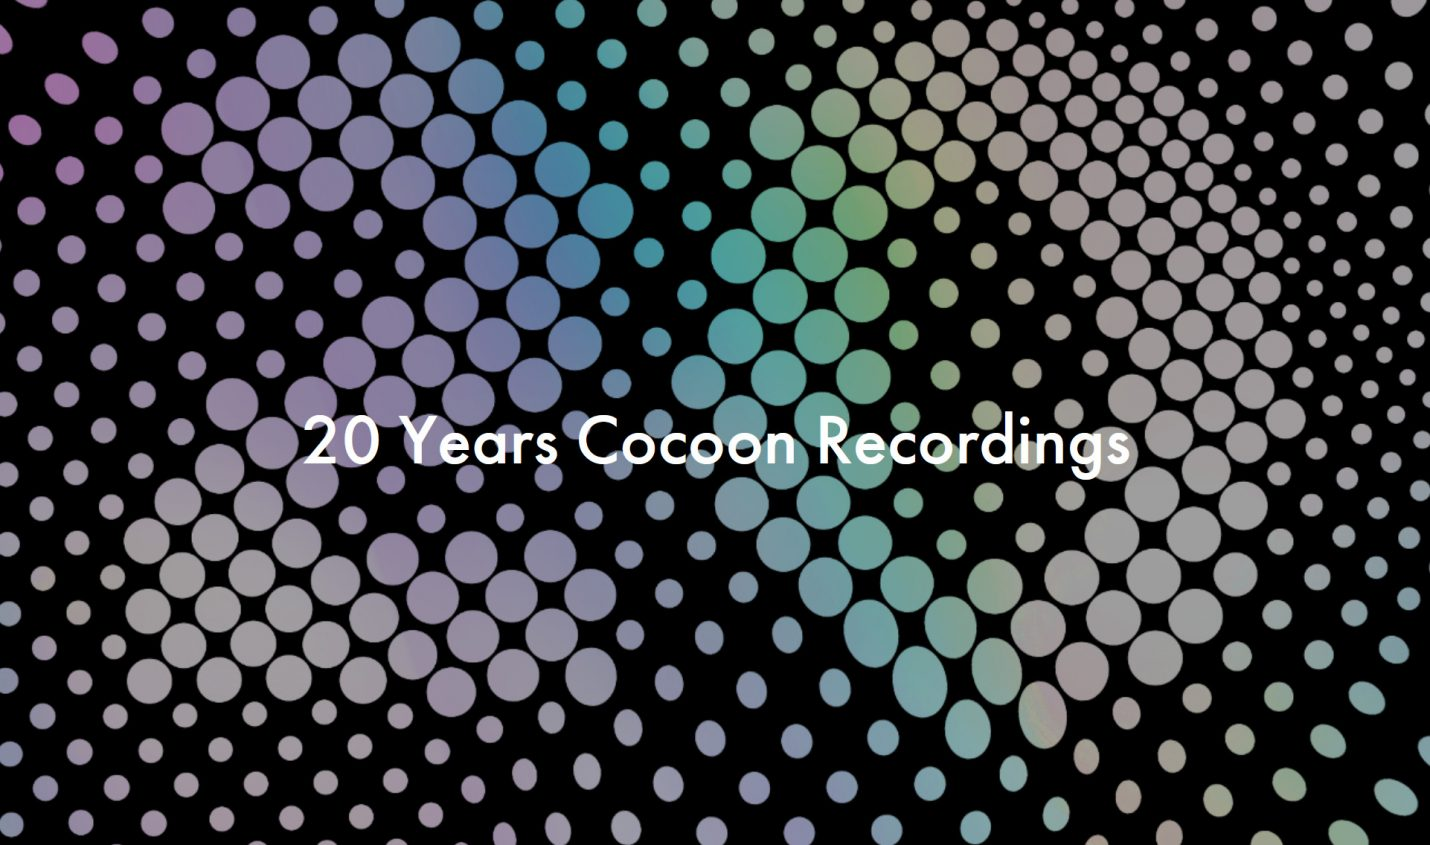 20 years Cocoon Recordings: Compilation kommt im Februar